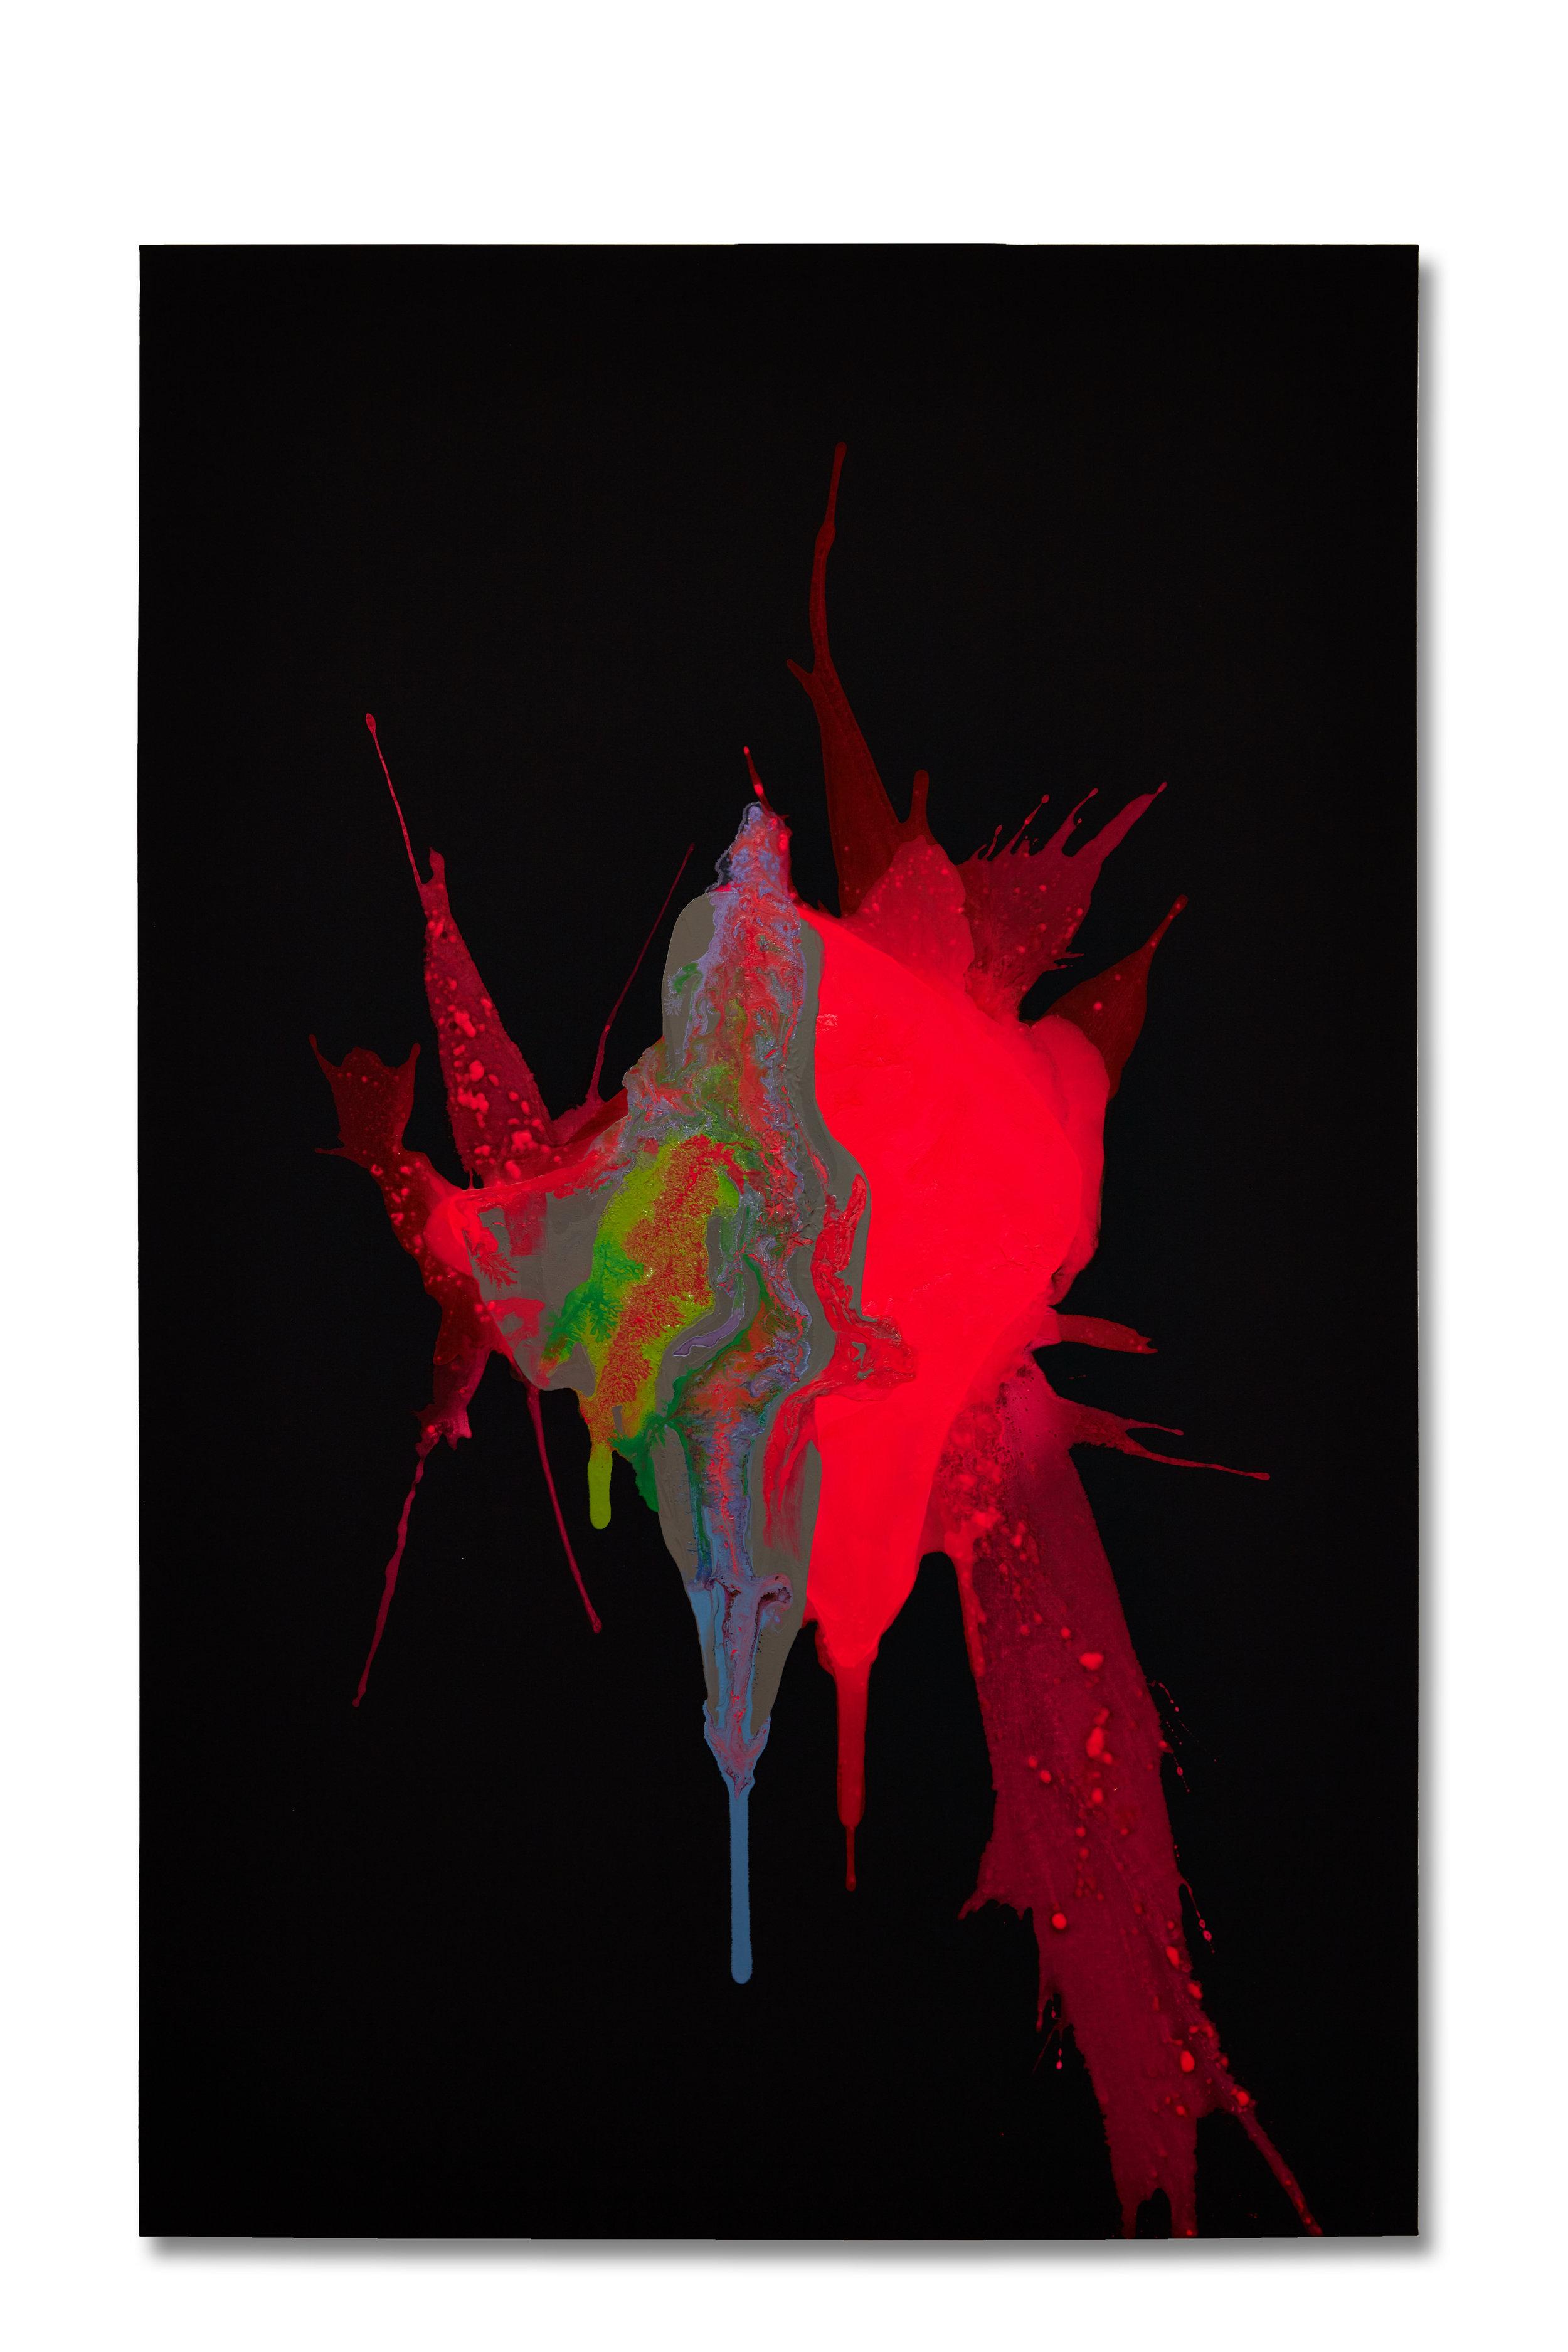 """Murder""  54x84 - acrylic/acrylic inks on partially primed black canvas"